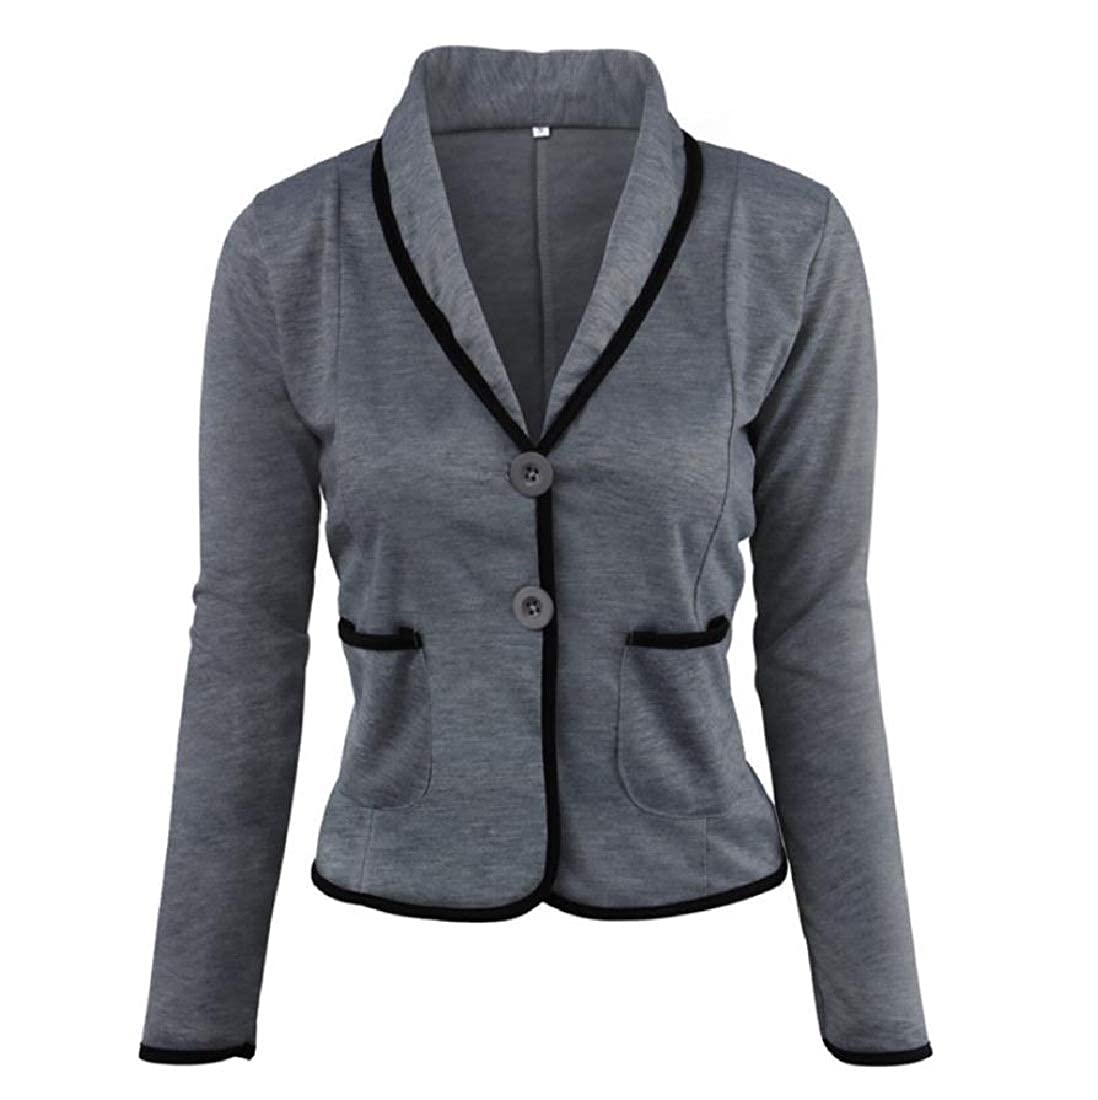 YUNY Women Outerwear Casual Performance Career Blazer Suit Coat Tops Dark Grey 3XL